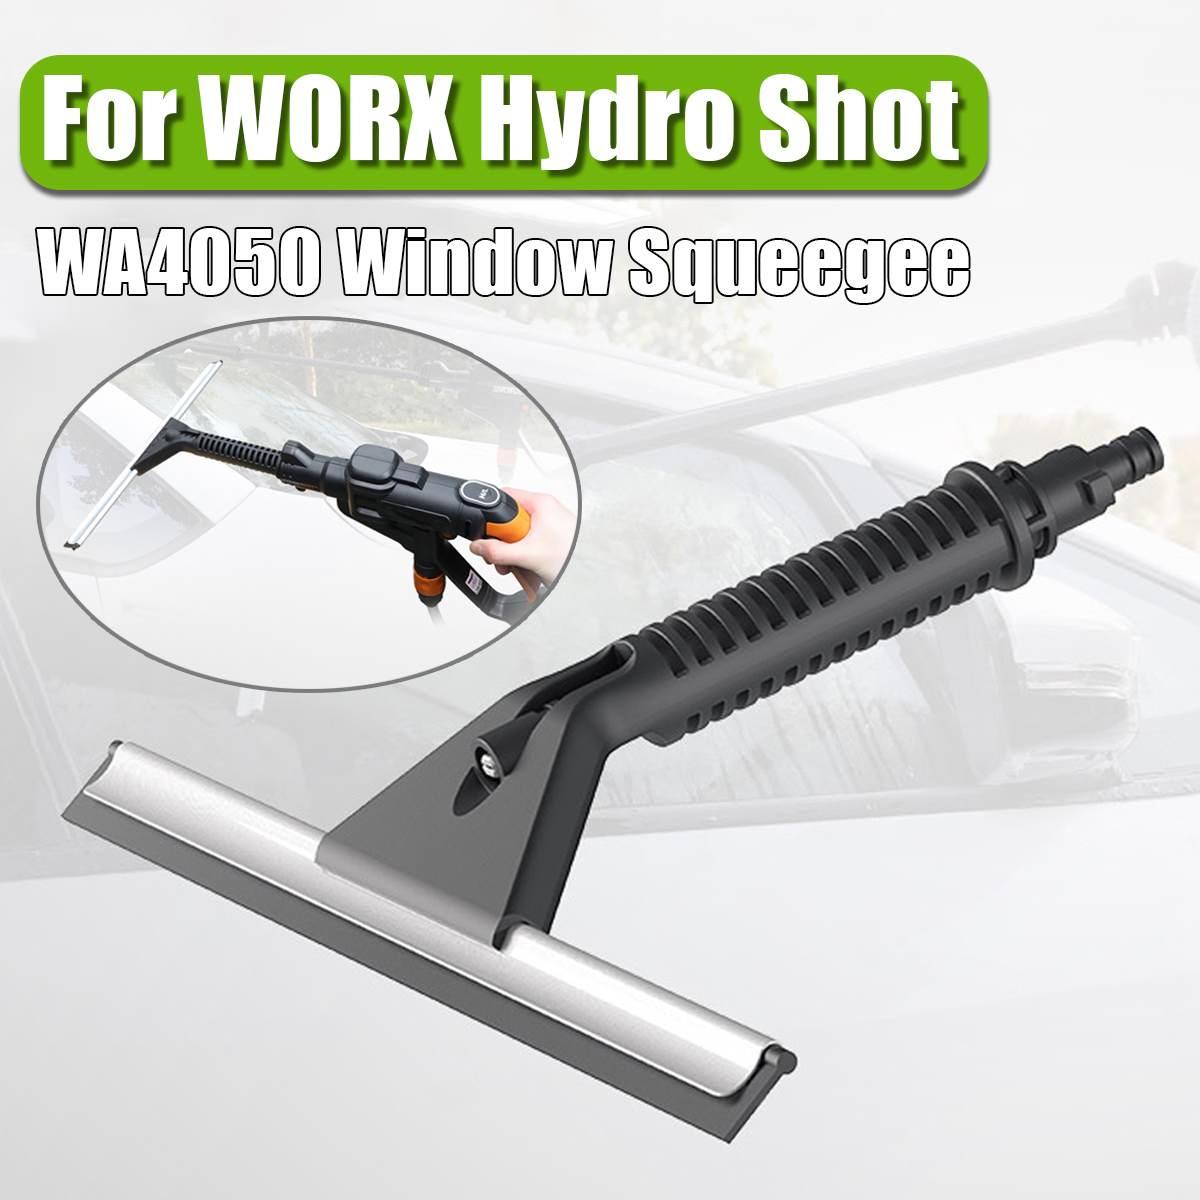 WORX WA4036 Hydro Shot Soap Bottle Accessory Black